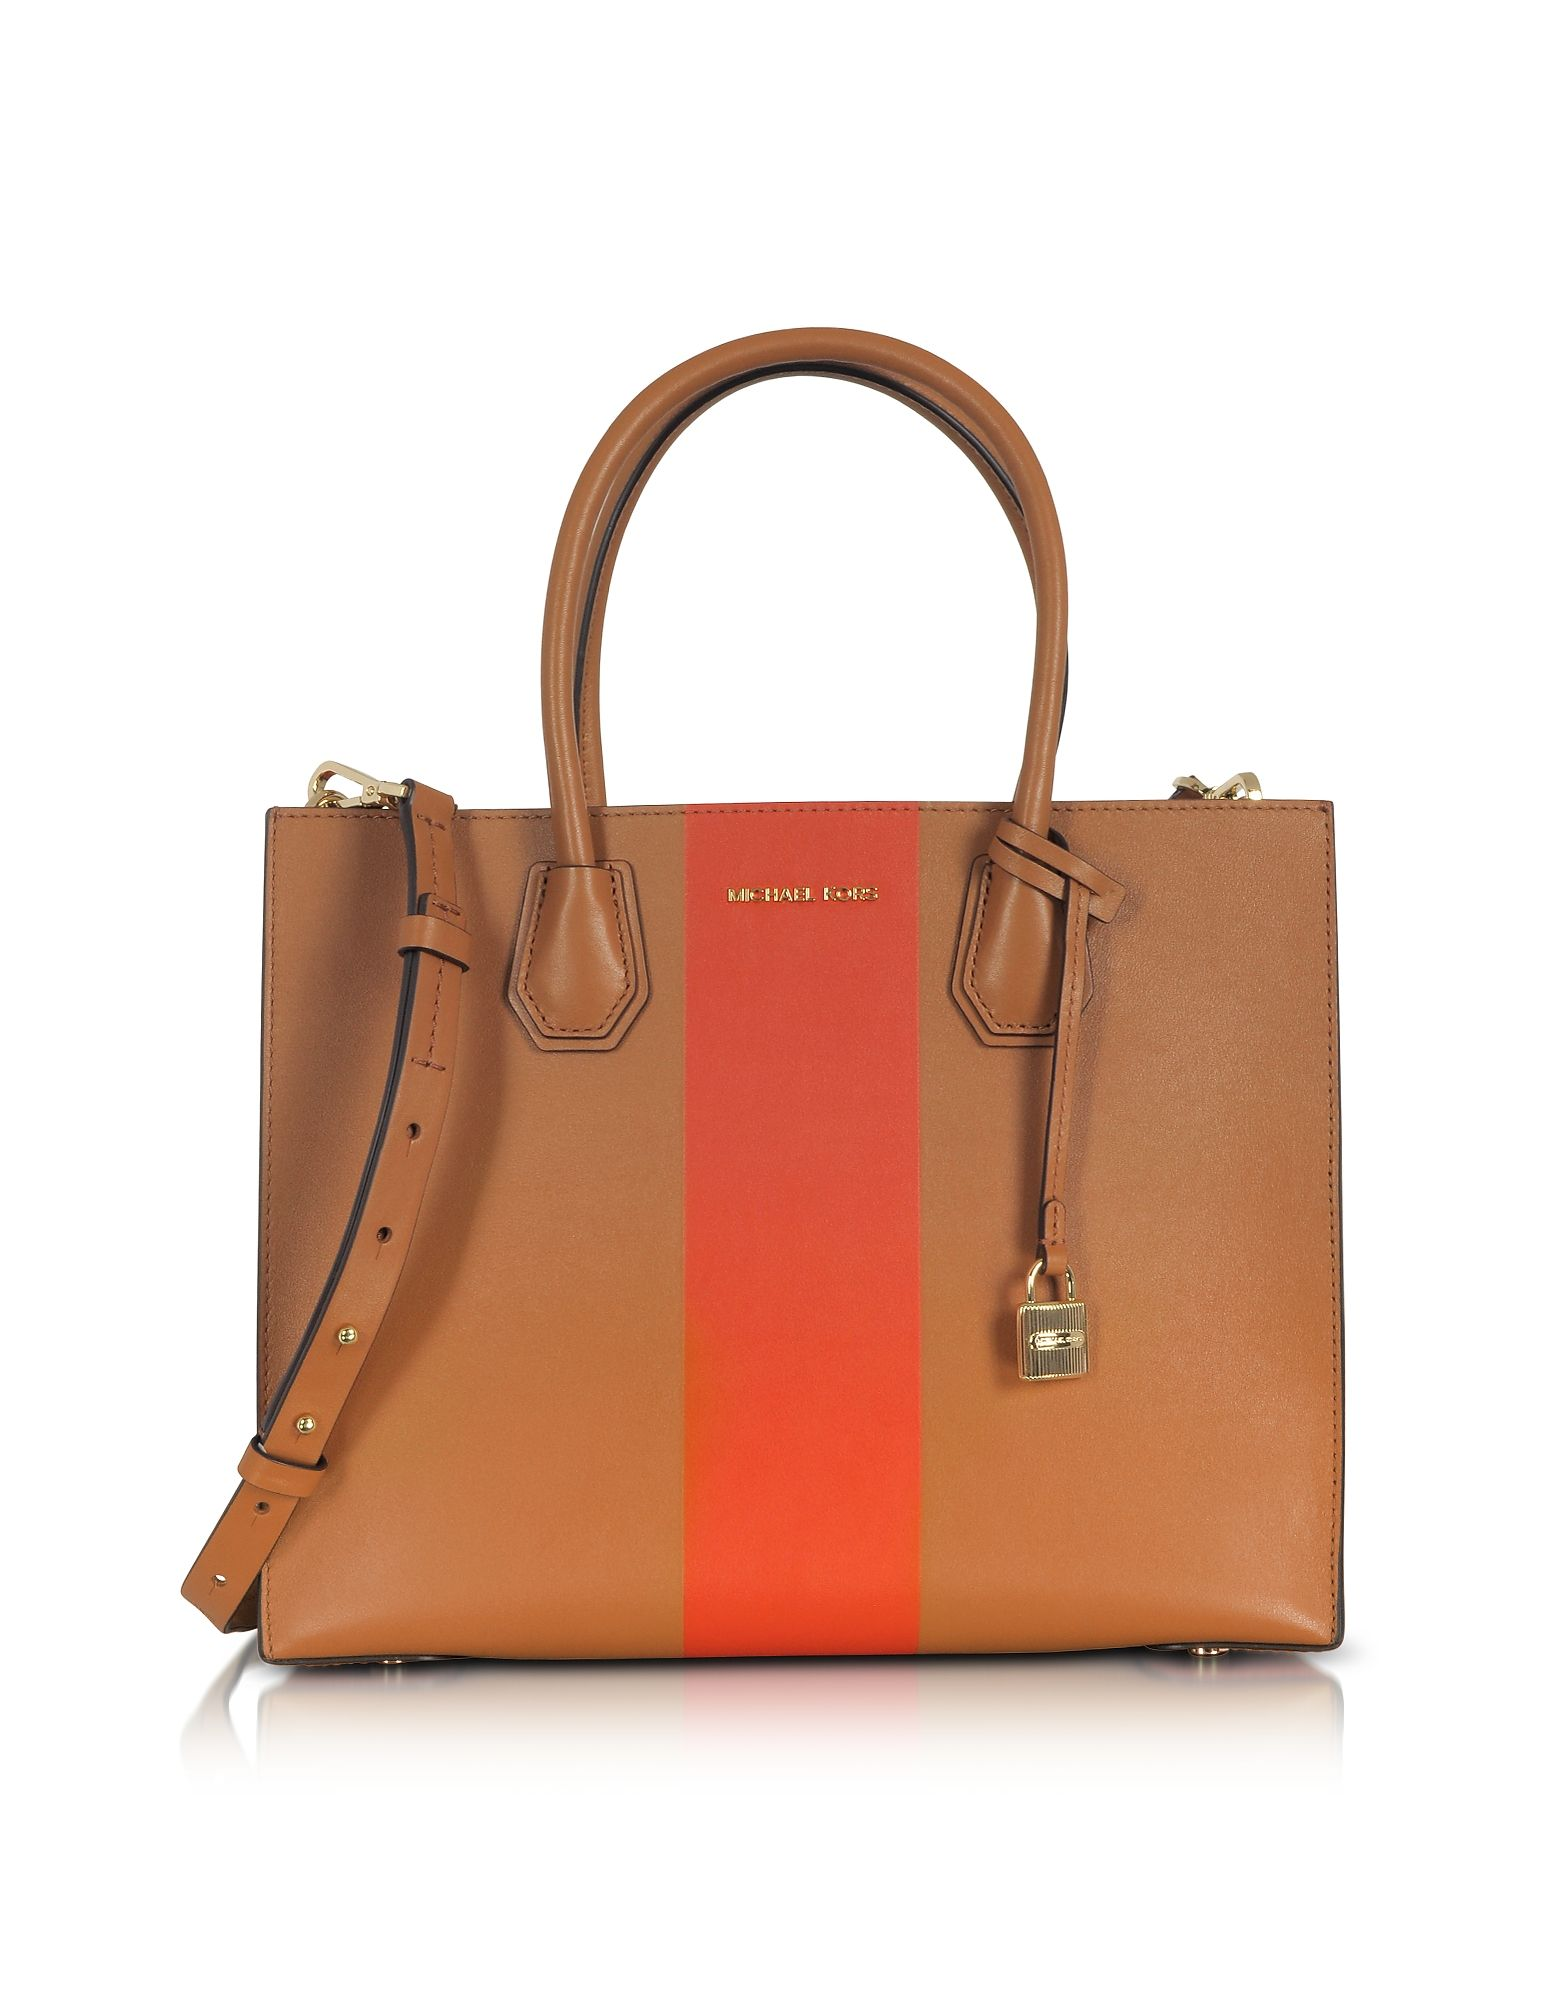 acc8706d82bf MICHAEL KORS MERCER LARGE ACORN   ORANGE CENTER STRIPE LEATHER CONVERTIBLE  TOTE BAG.  michaelkors  bags  shoulder bags  hand bags  leather  tote